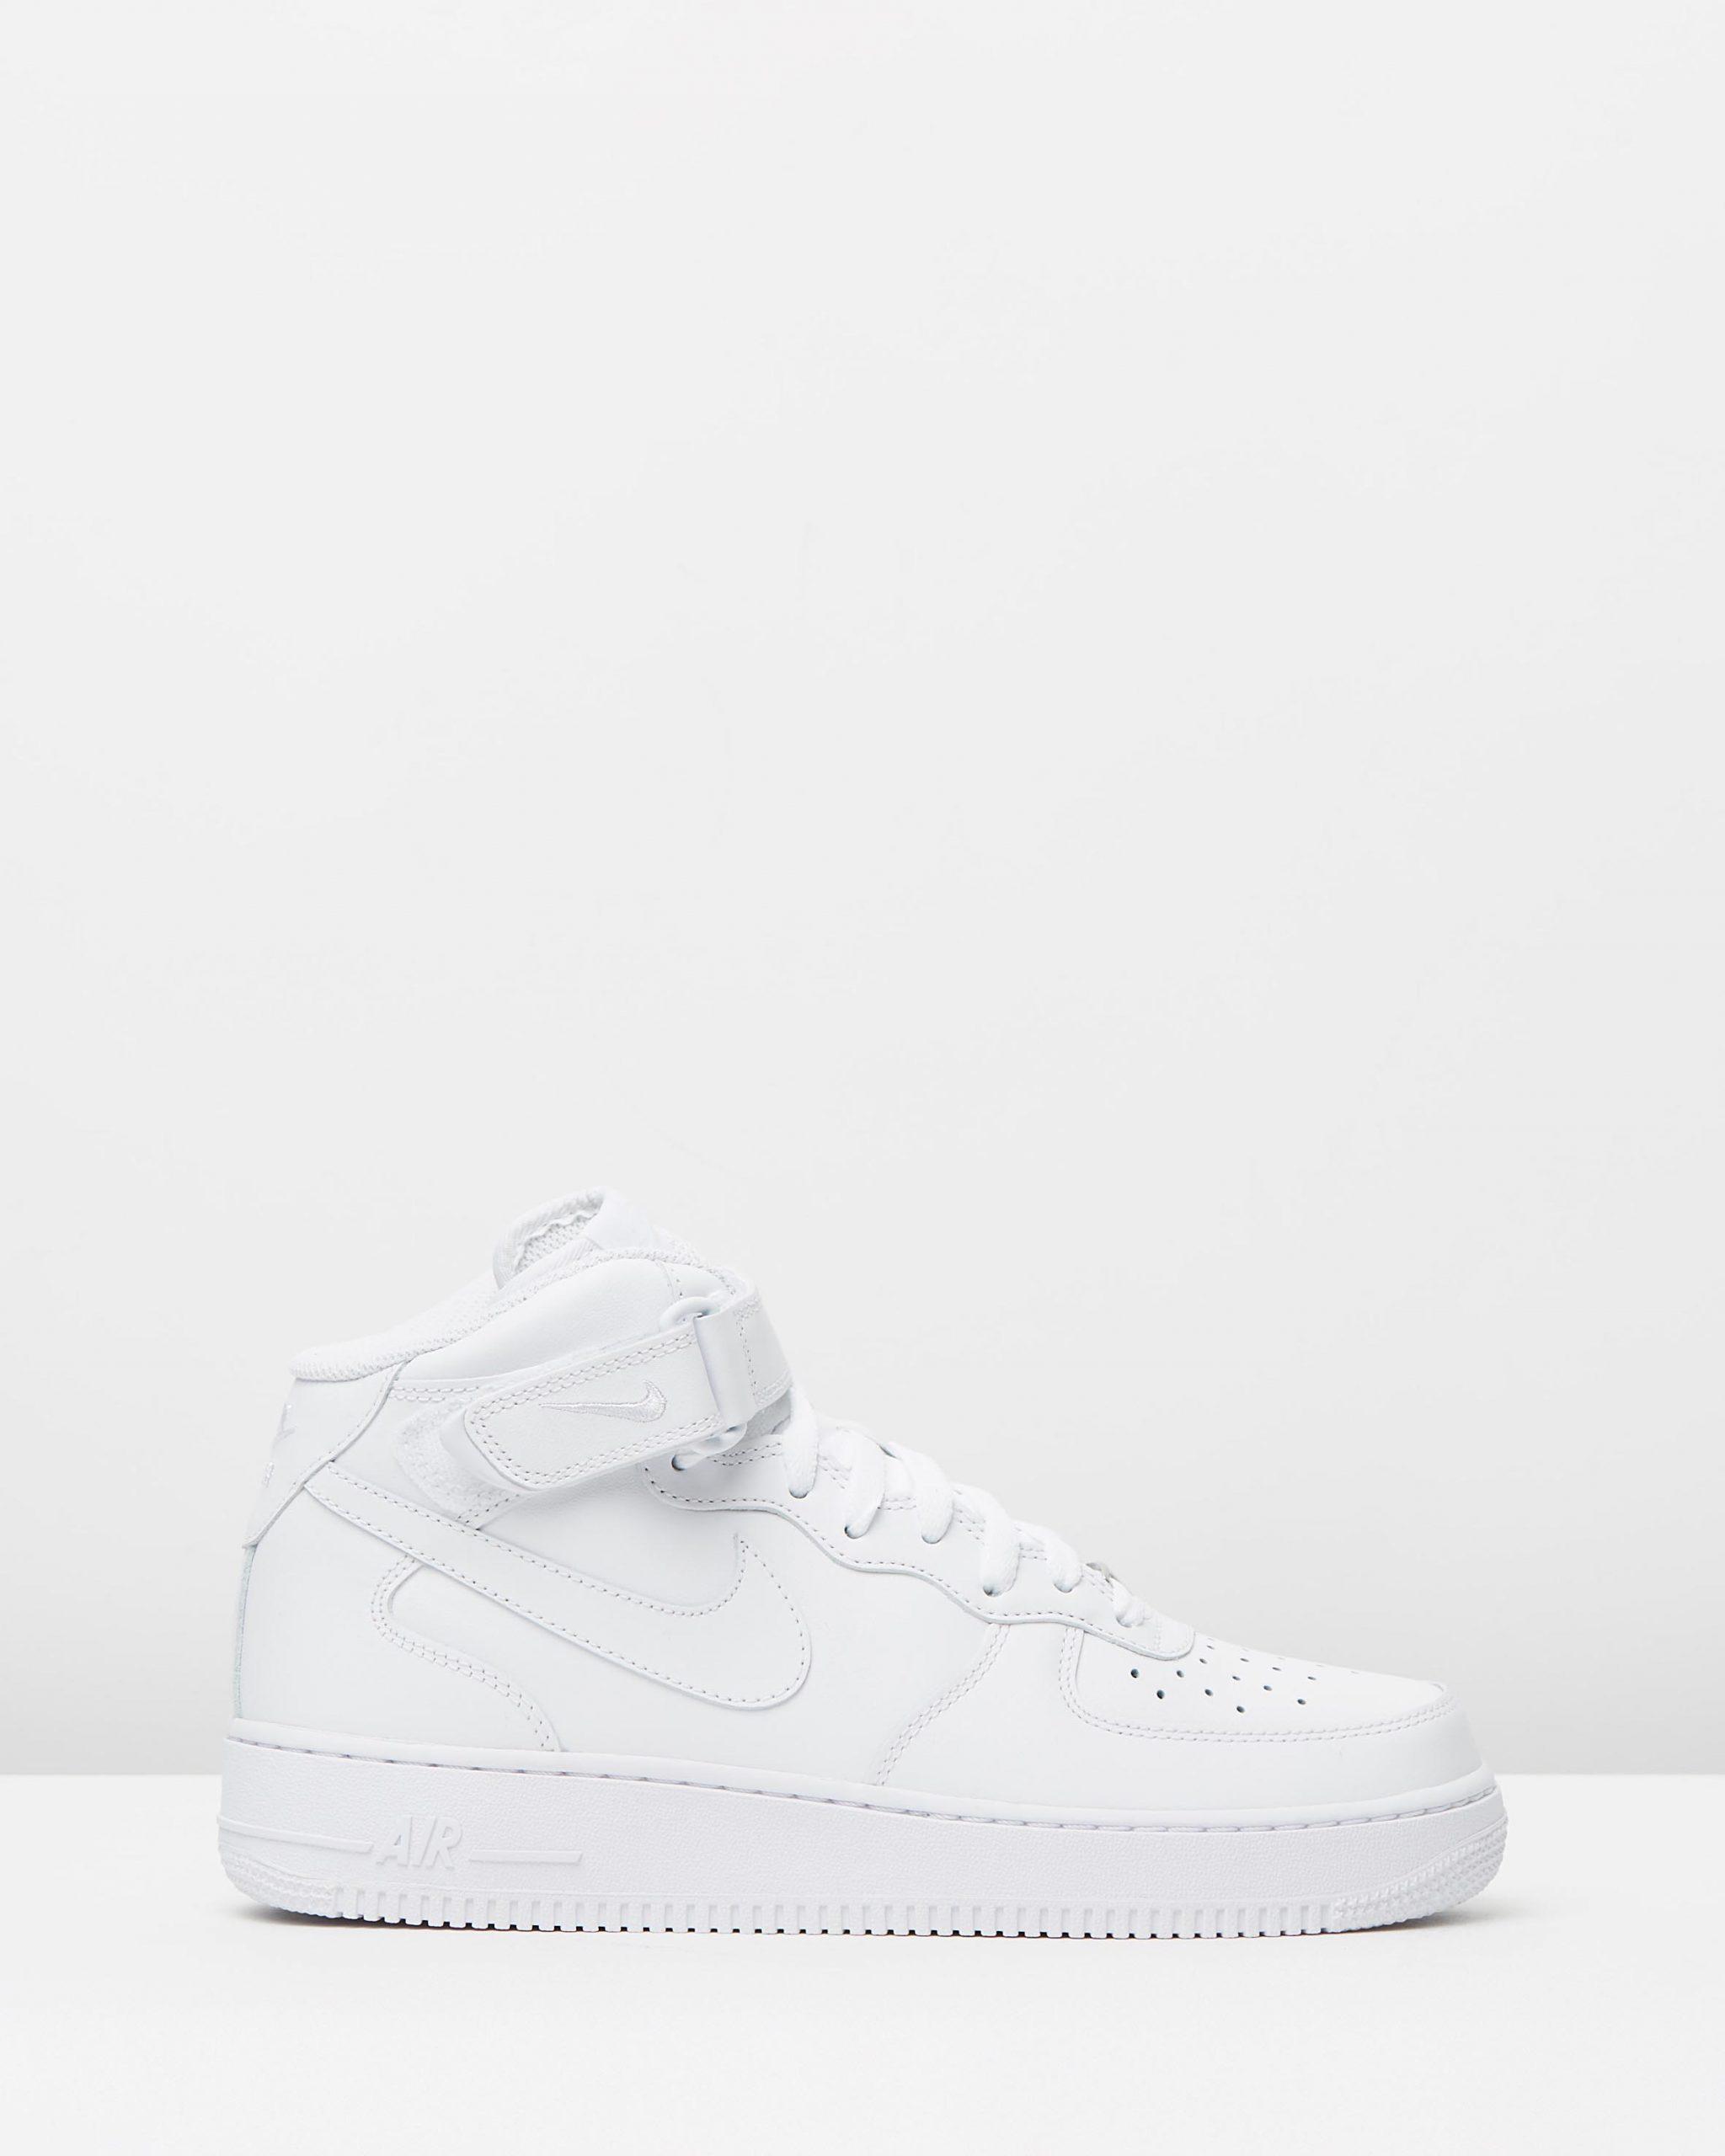 Nike Men's Air Force 1 Mid '07 White